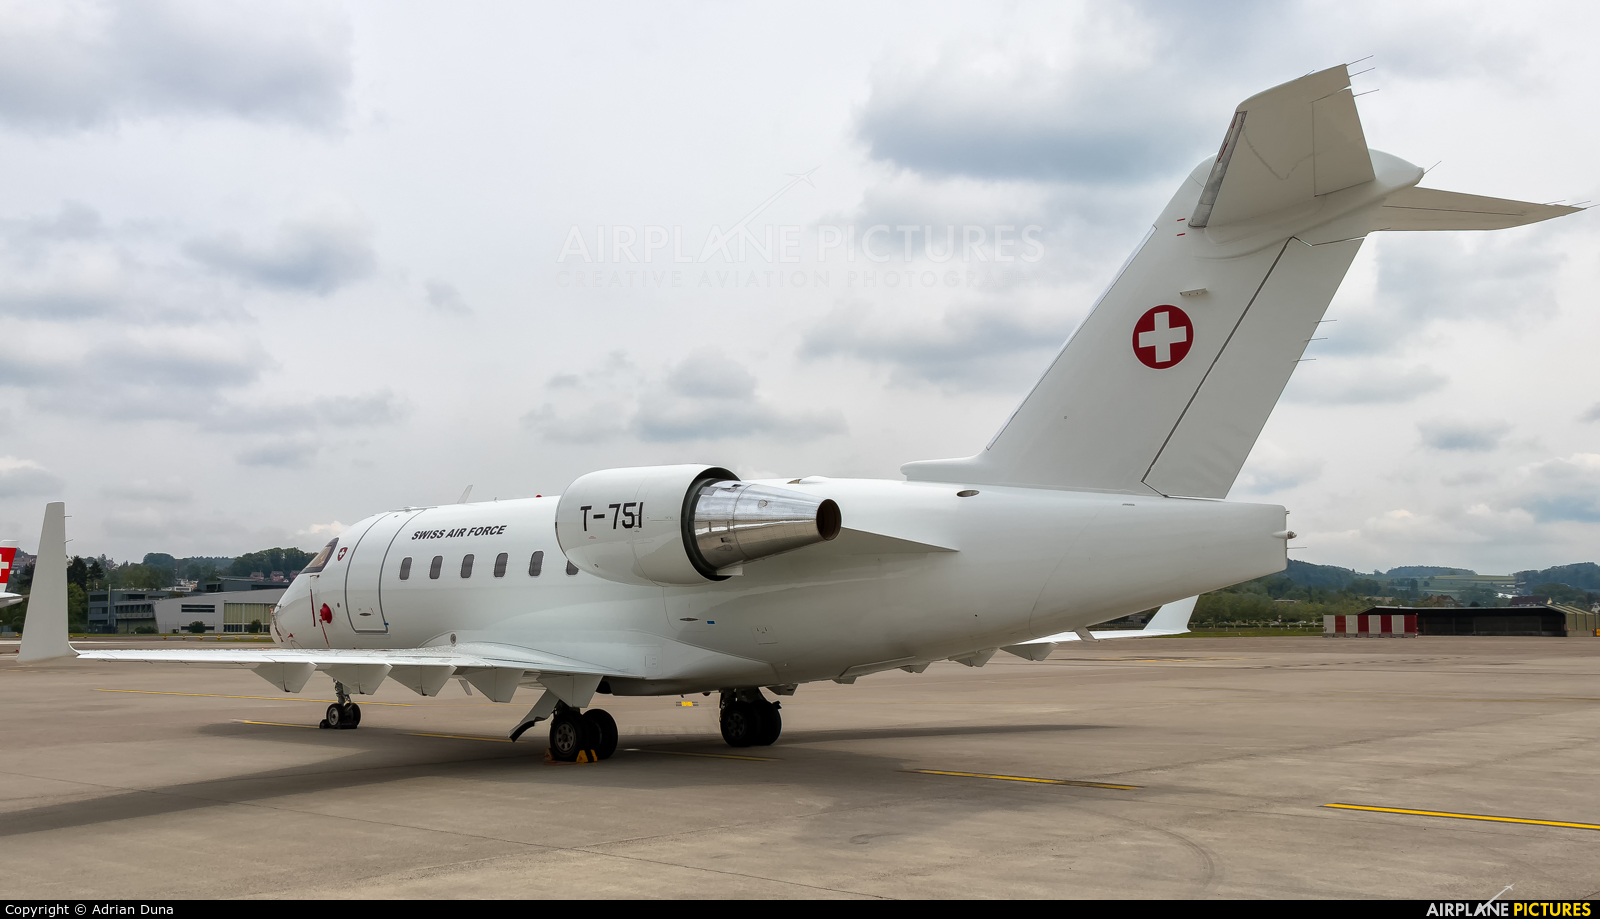 Switzerland - Air Force T-751 aircraft at Zurich